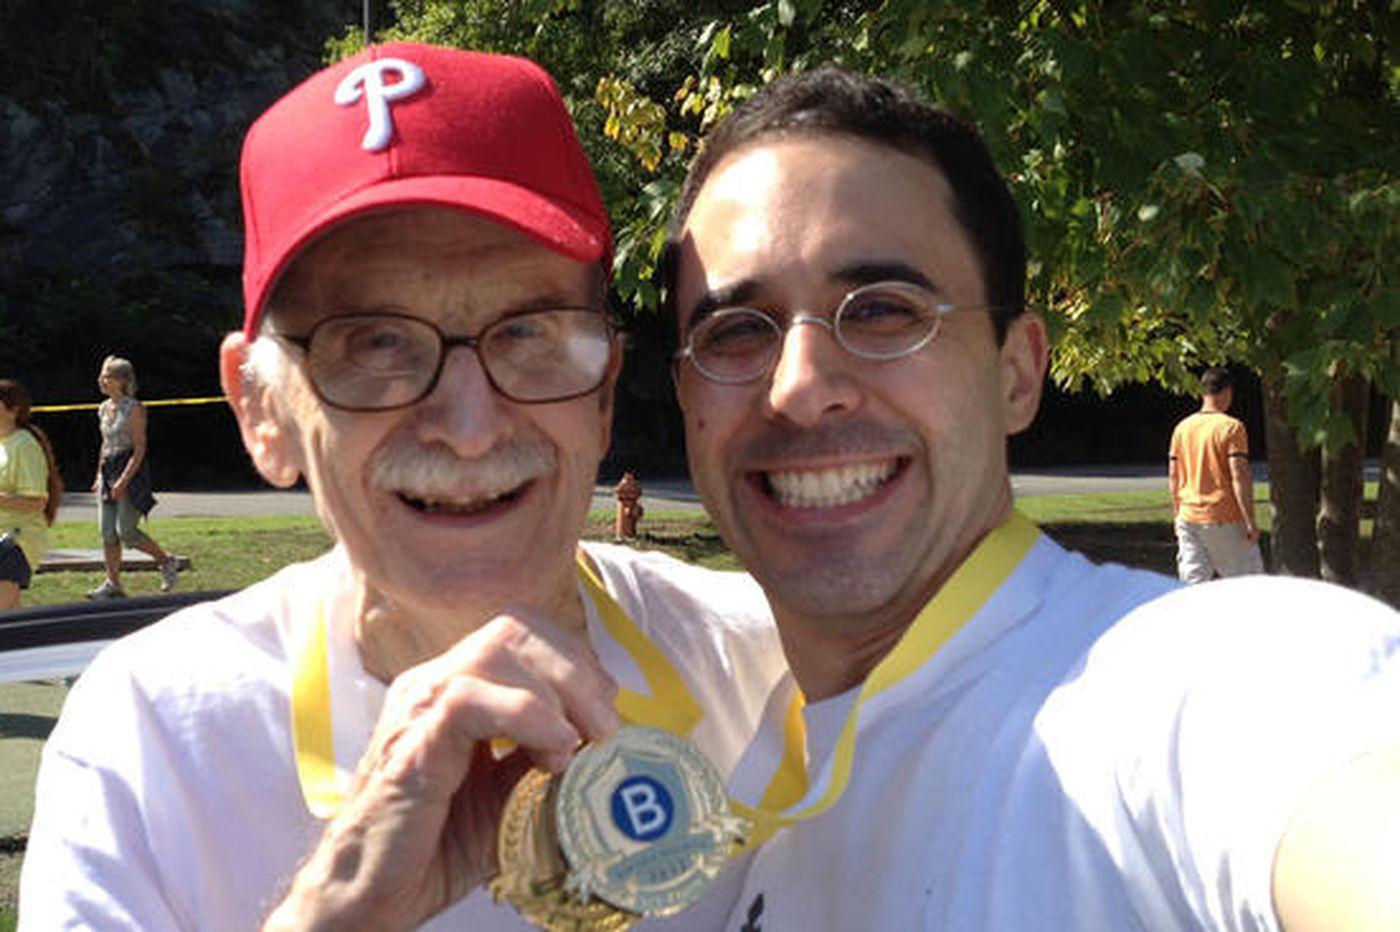 Edward Olin Goodrich Jr., 92, former surgeon who lived joyful life despite own illnesses